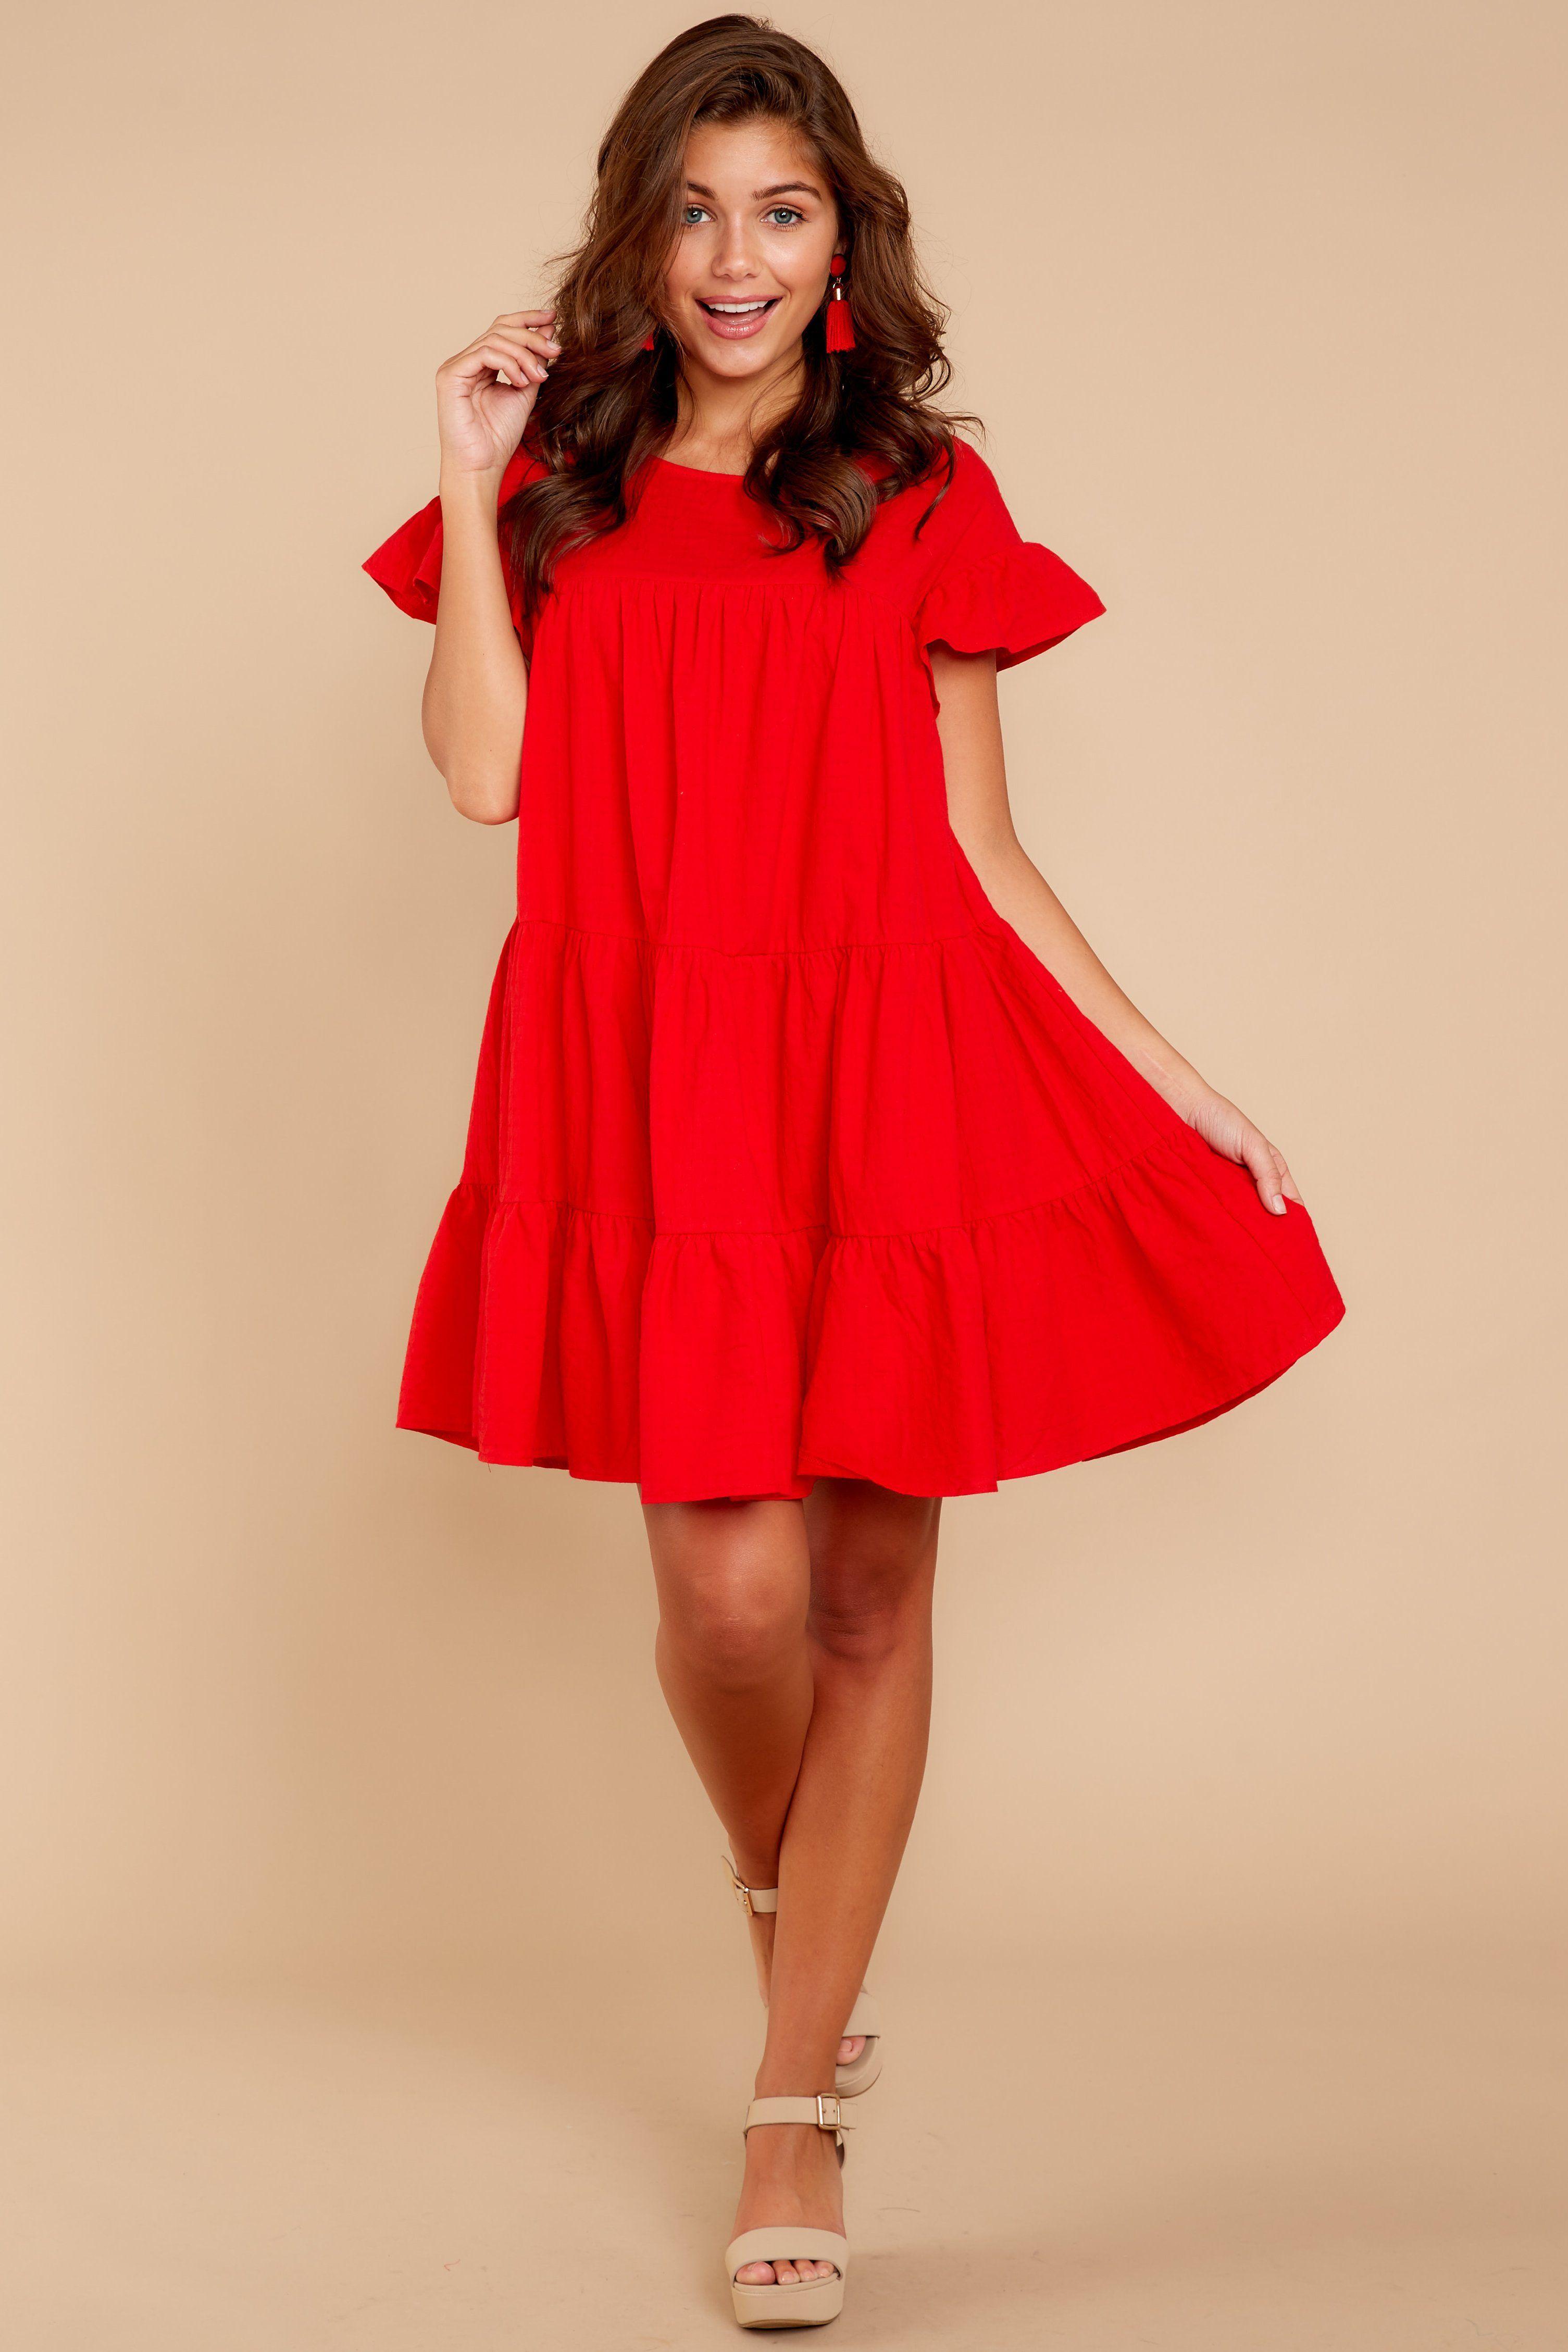 67caecf40db Chic Red Shift Dress - Short Ruffled Babydoll Dress - Dress -  49.00 – Red  Dress Boutique